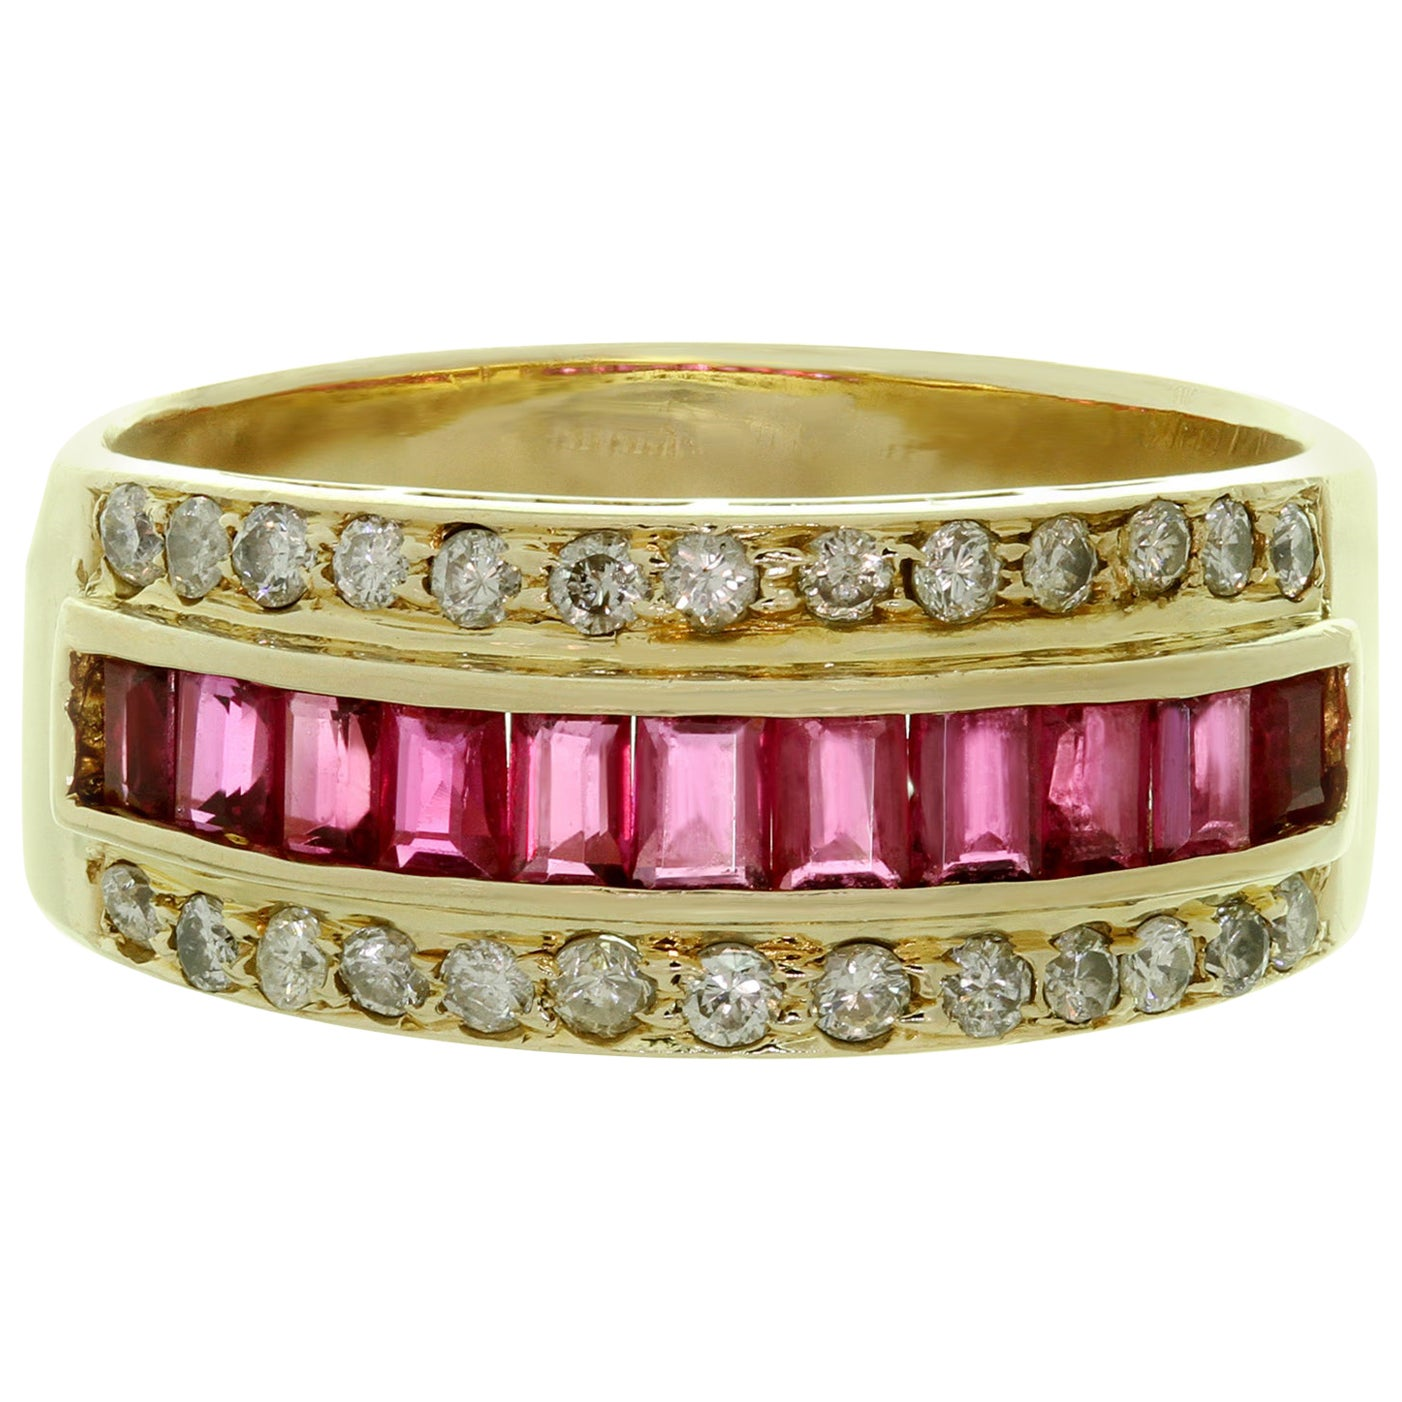 Diamond Baguette-Cut Ruby Yellow Gold Band Ring